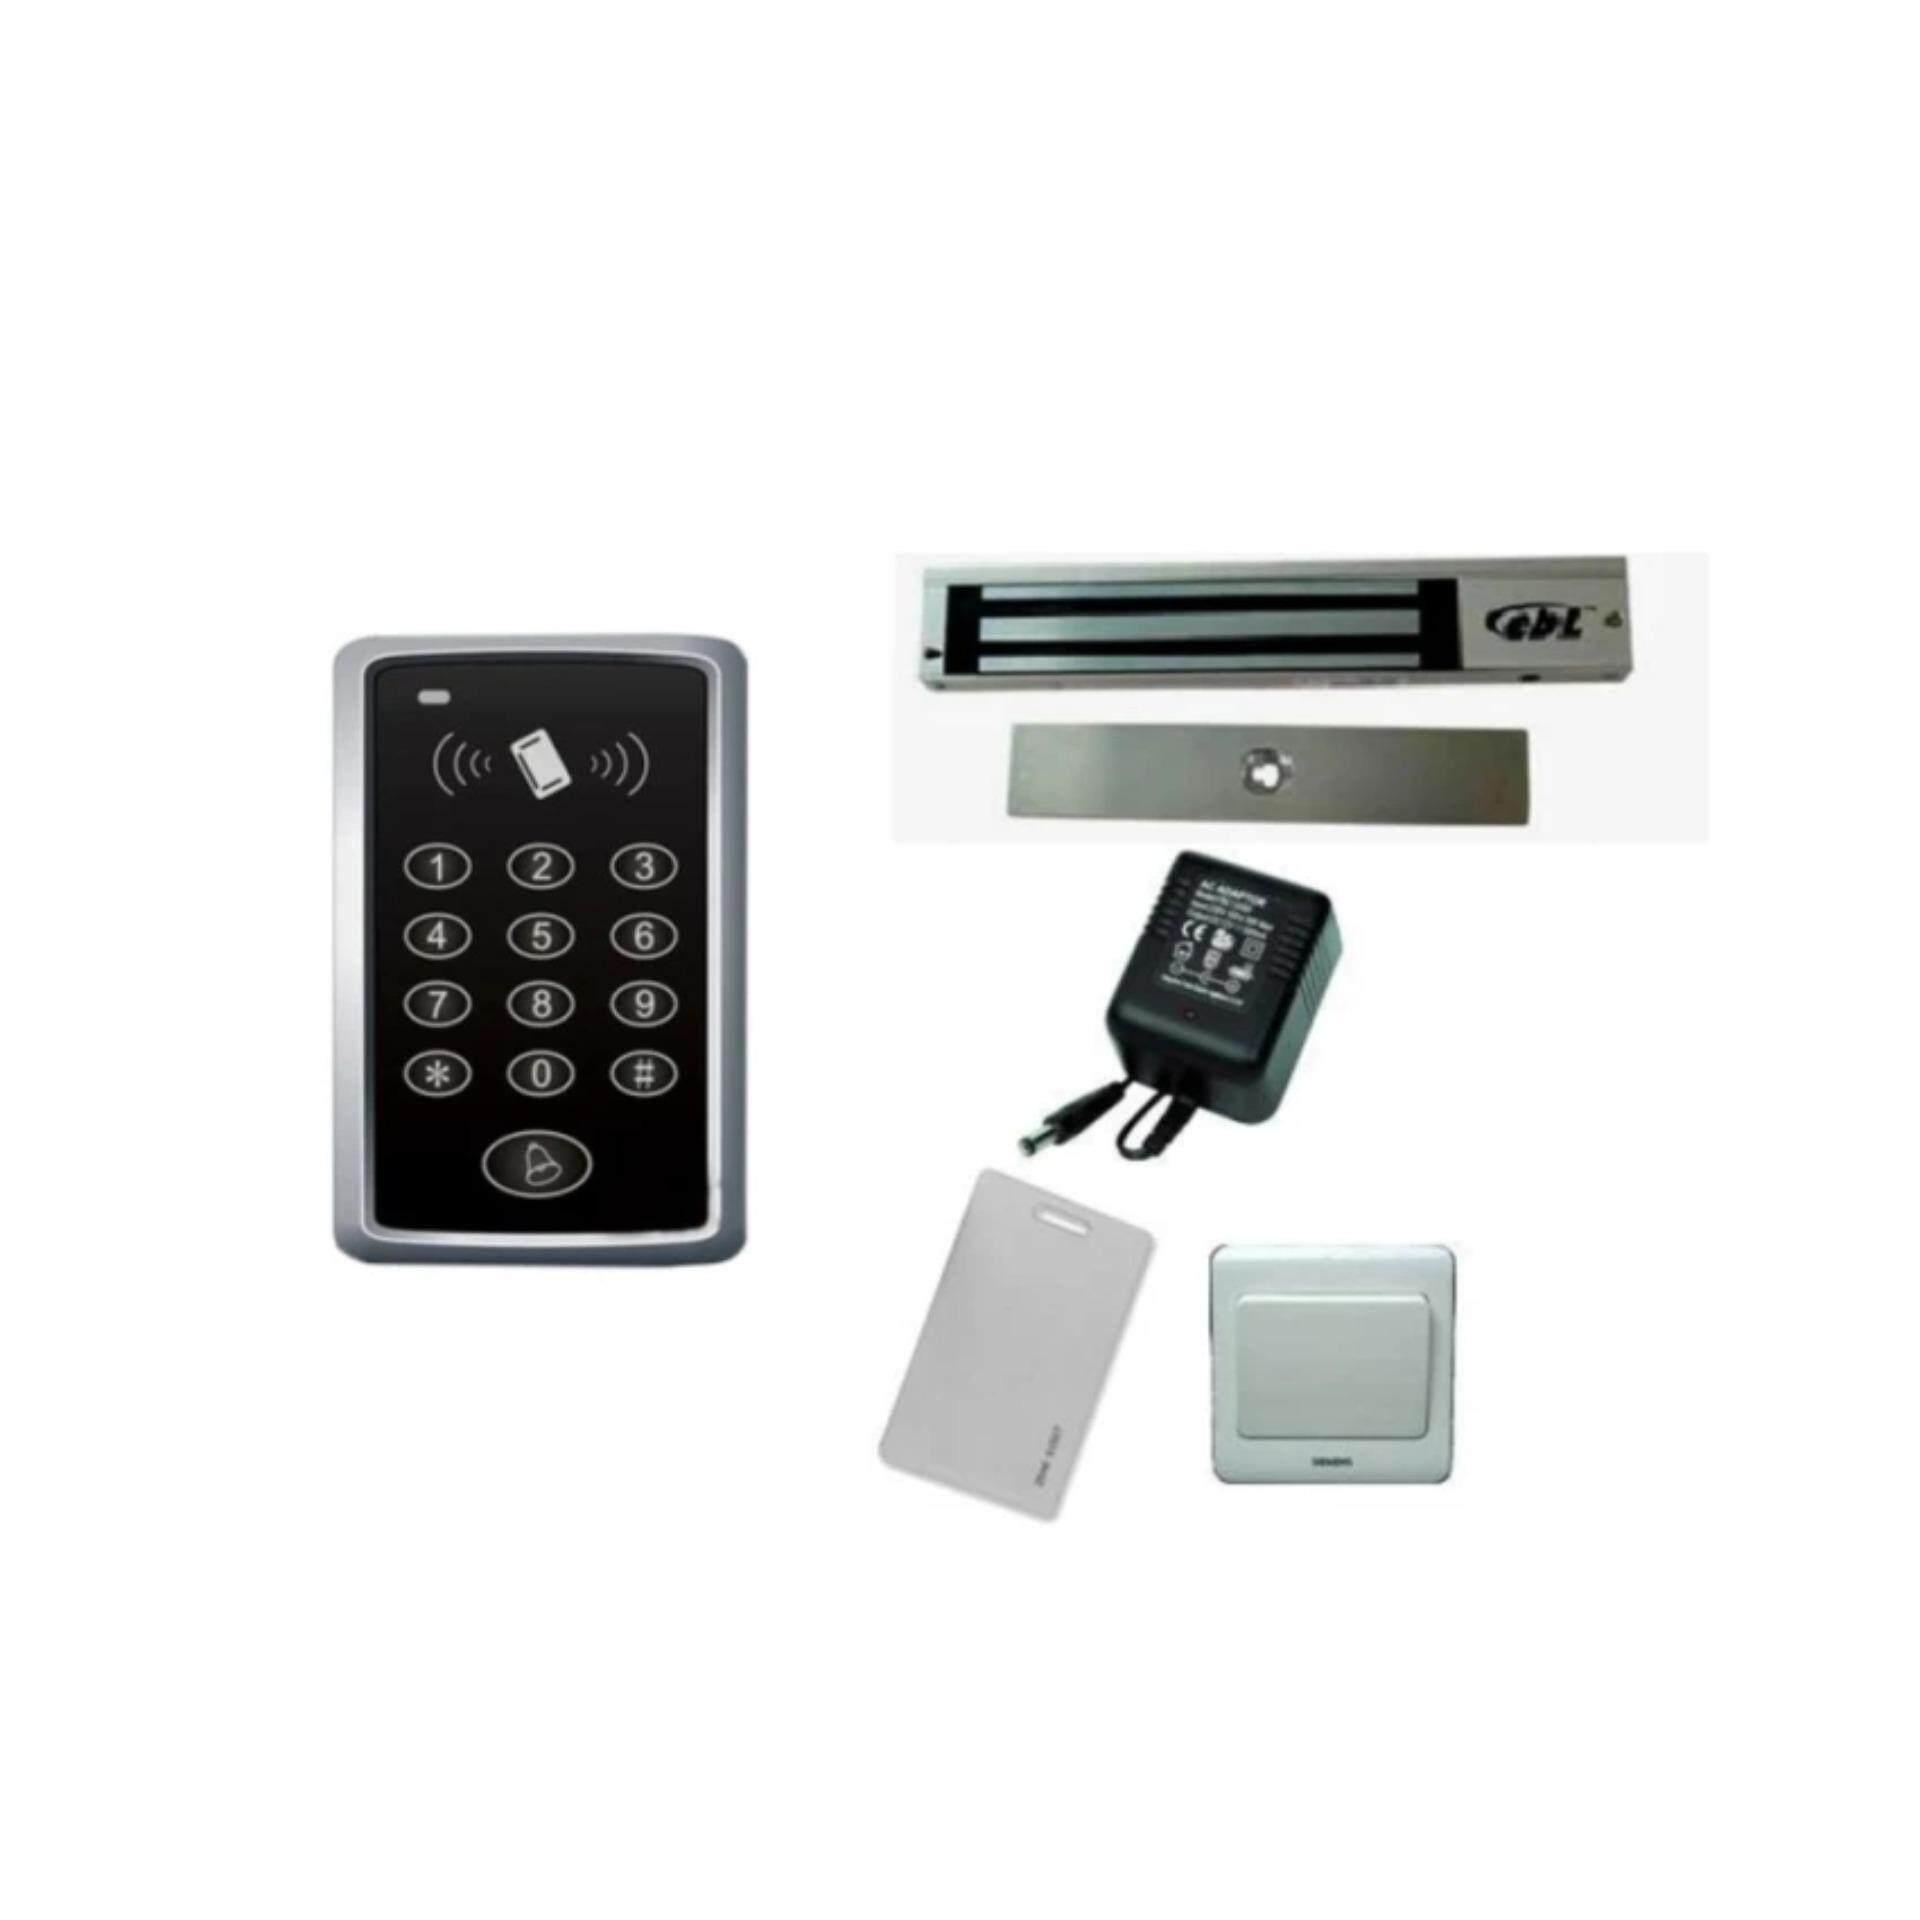 Rfid Door Access Card System Door Lock 8 Years Warranty